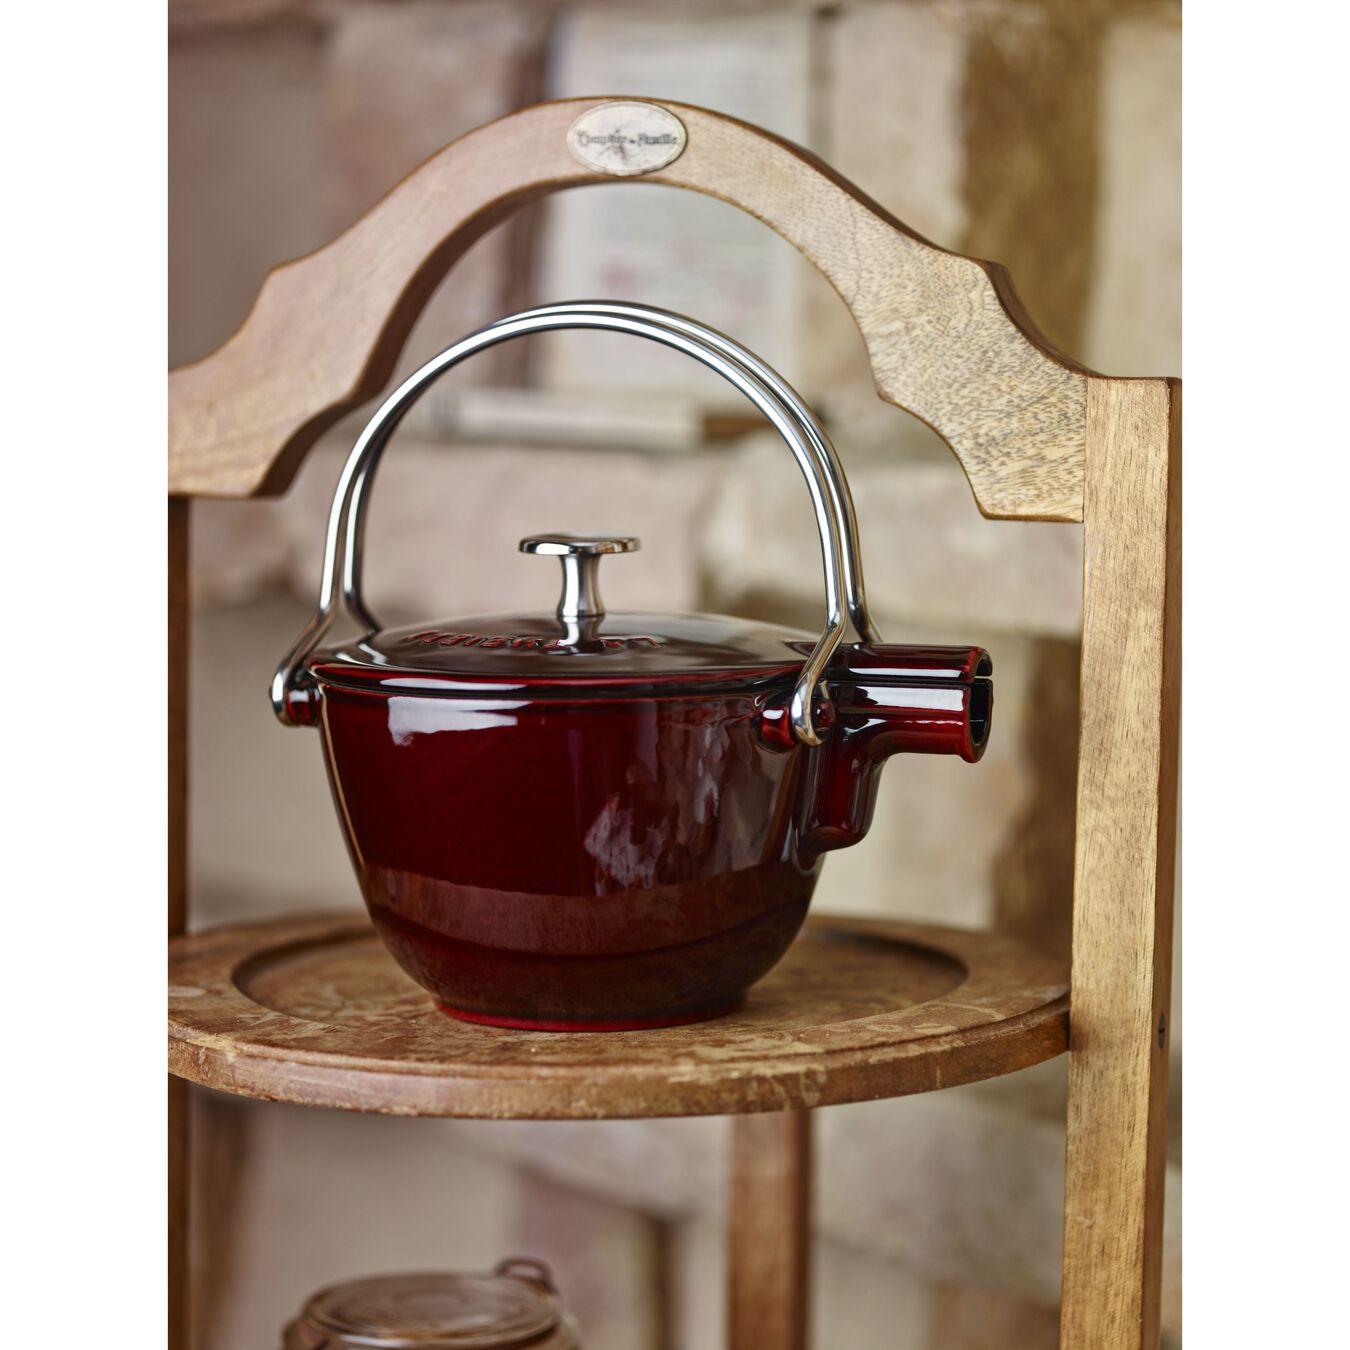 1-qt Round Tea Kettle - Grenadine,,large 7